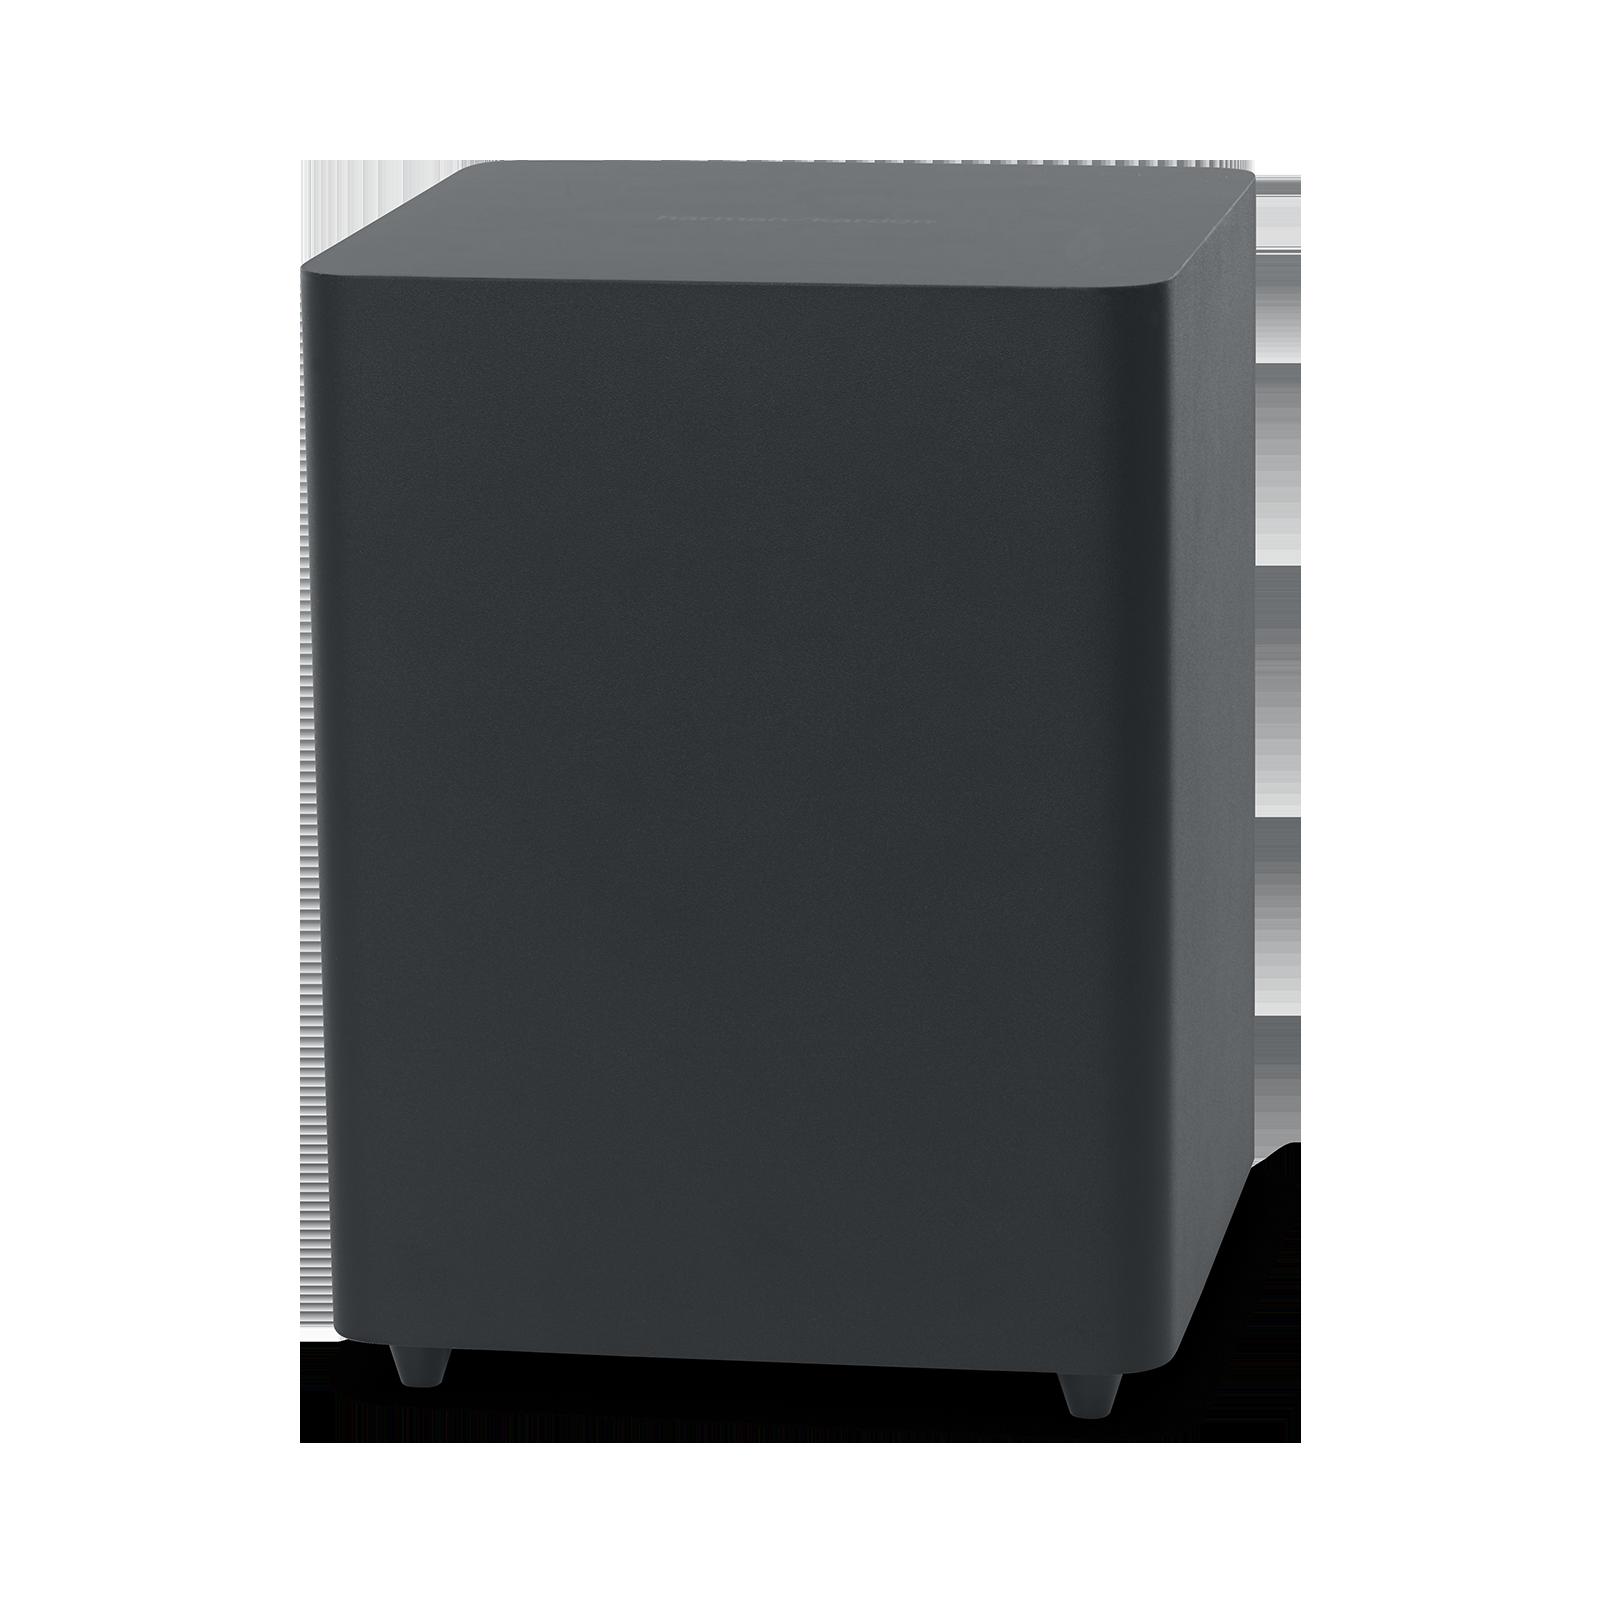 HK SB20 - Black - Advanced soundbar with Bluetooth and powerful wireless subwoofer - Detailshot 2